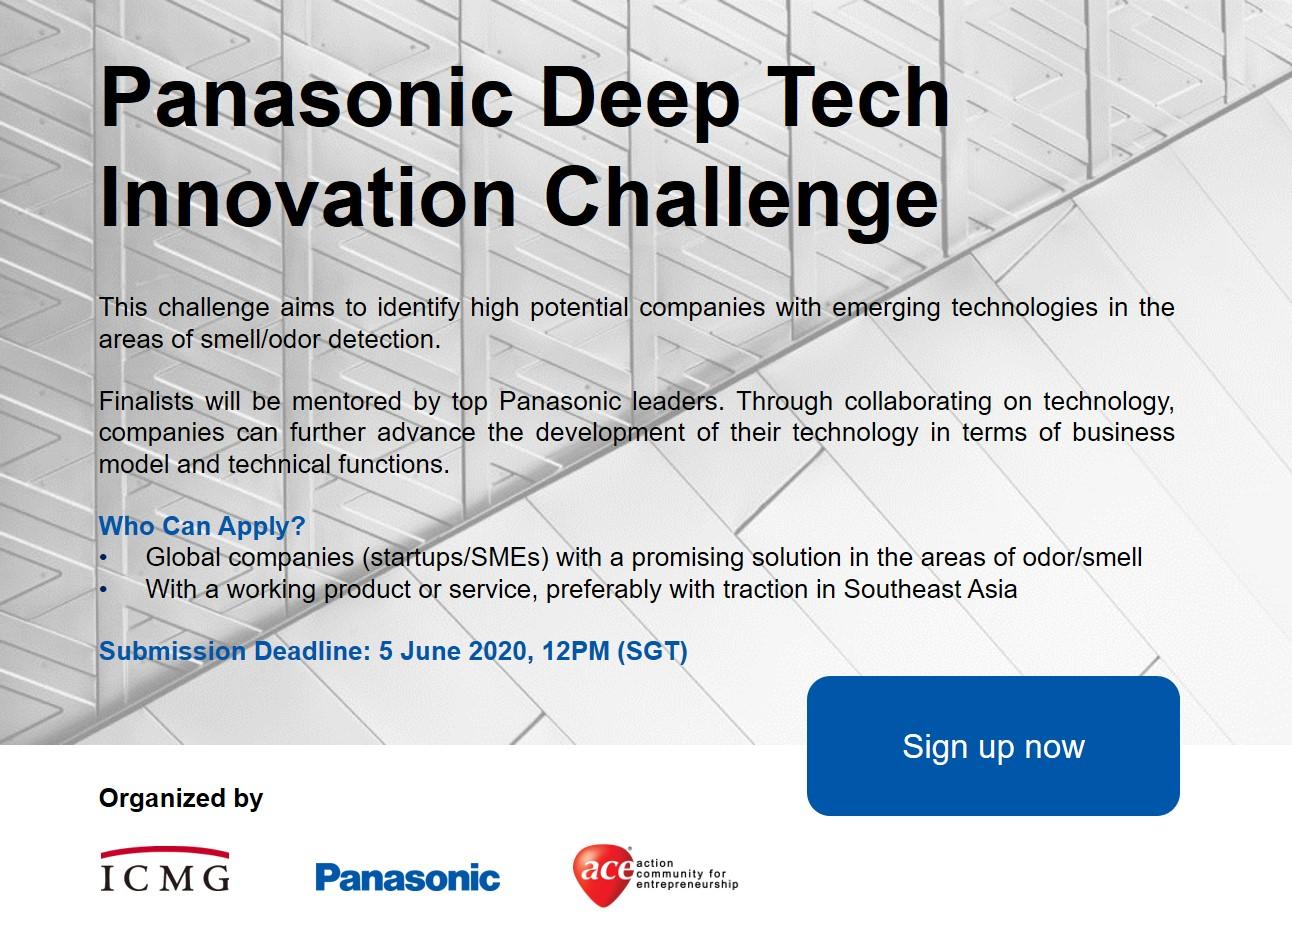 Panasonic Deep Tech Innovation Challenge